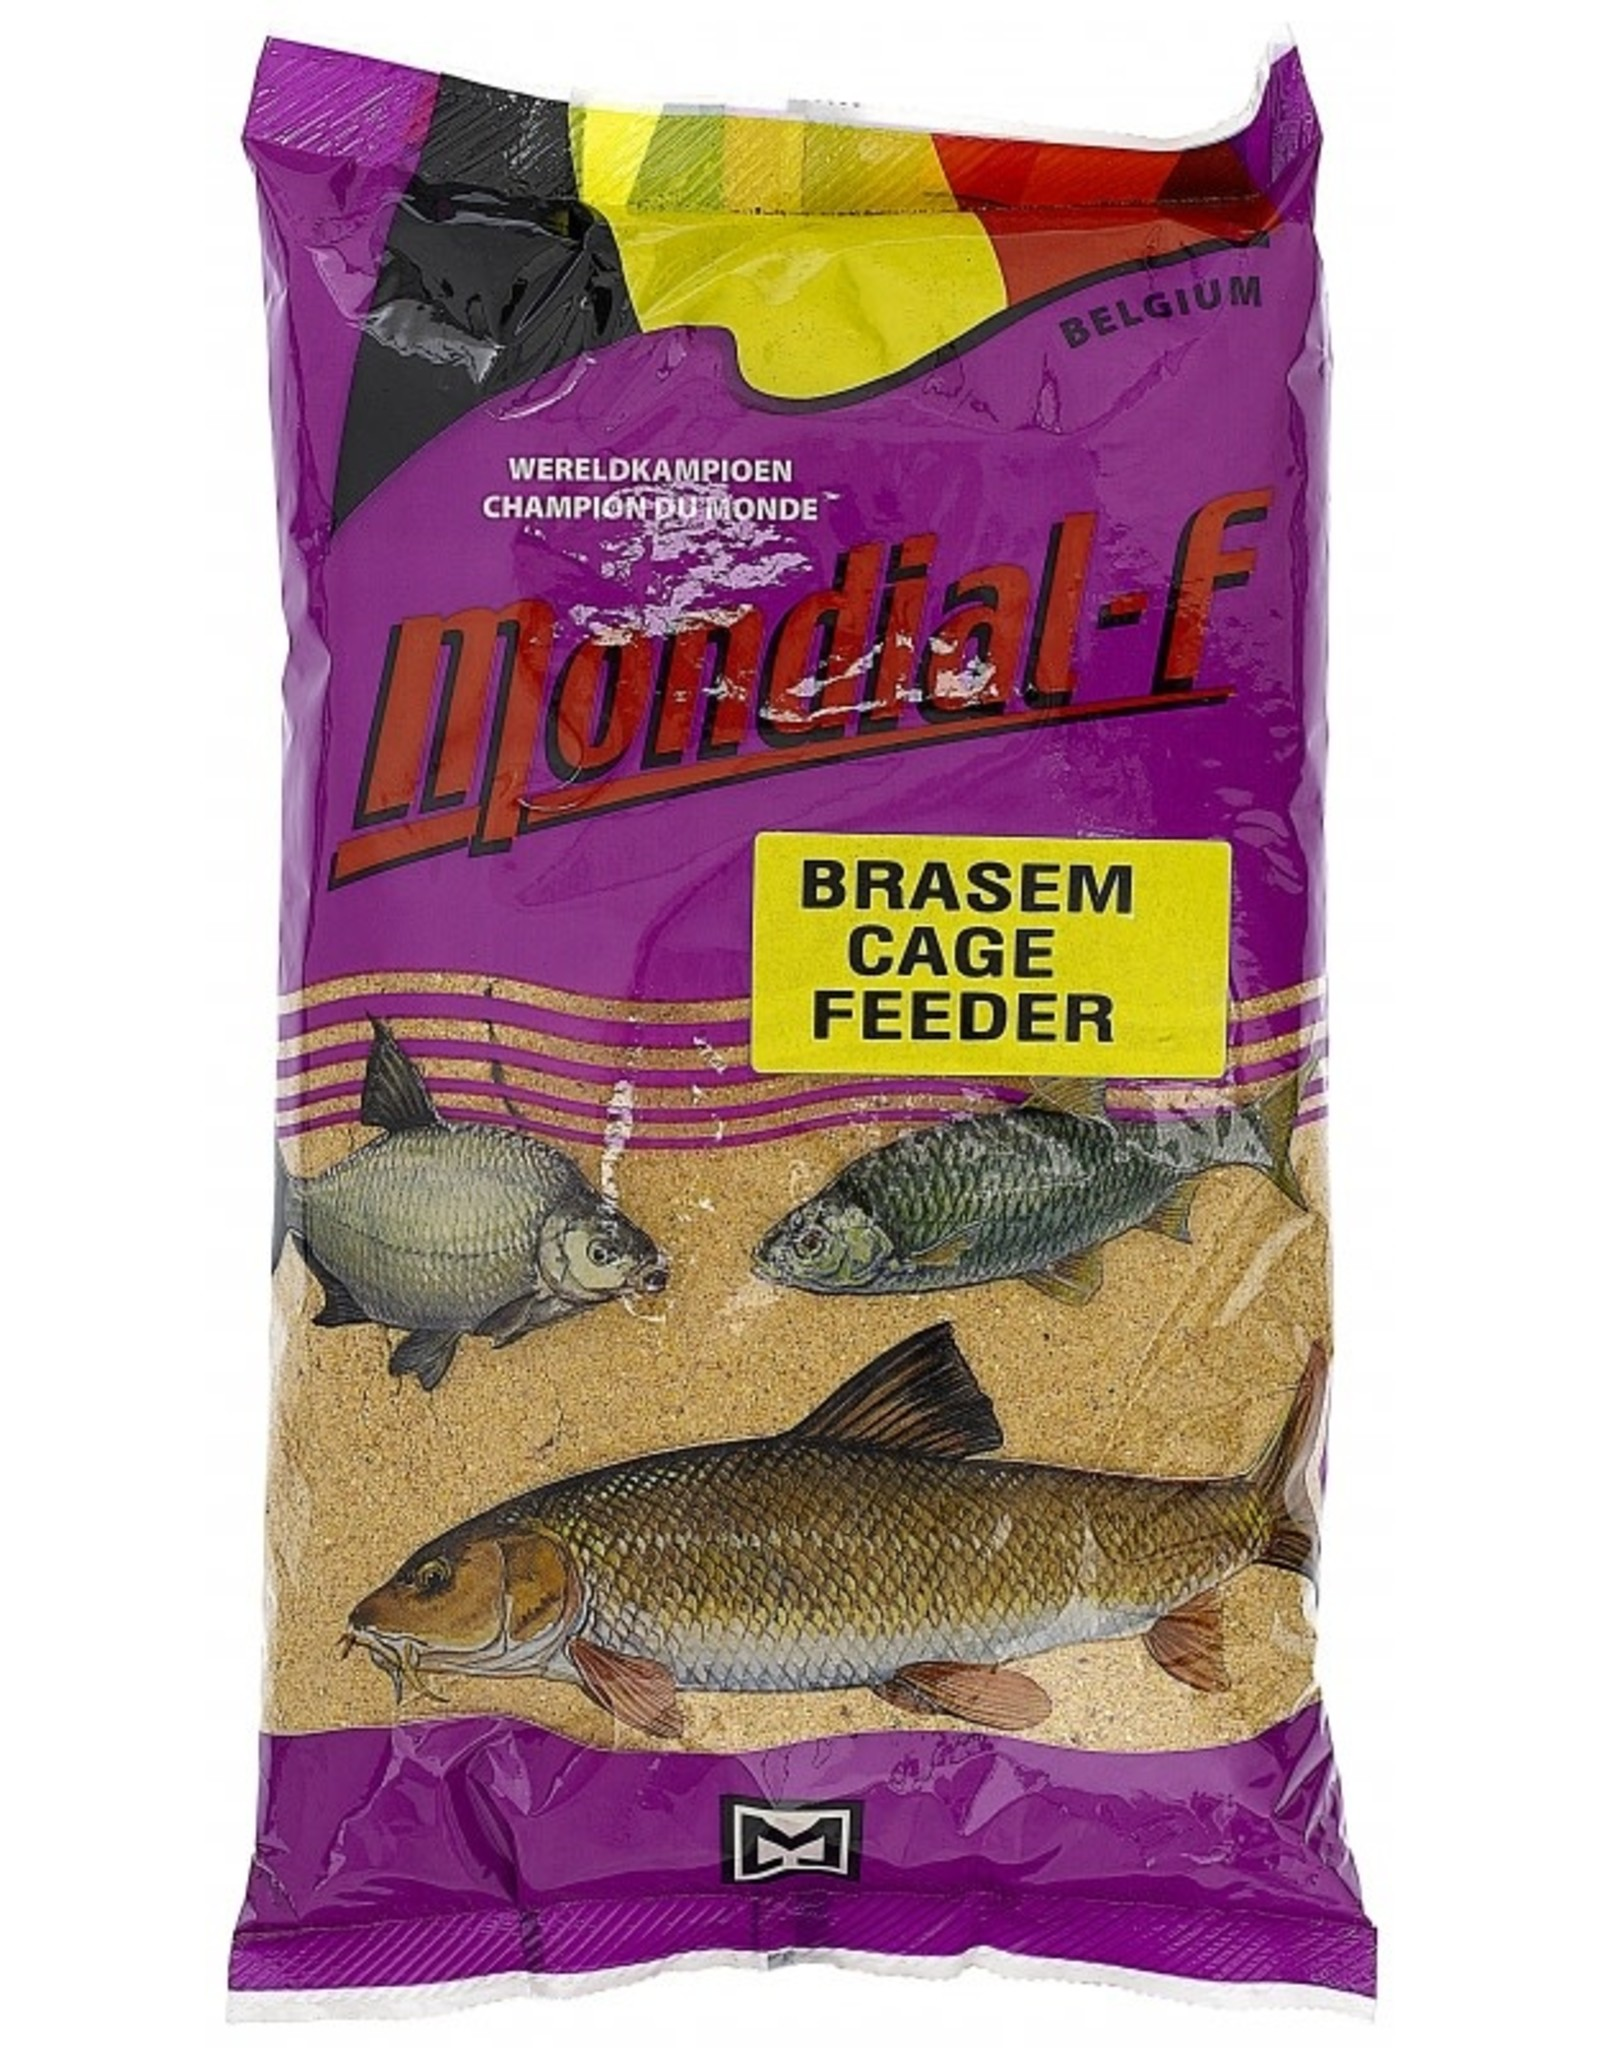 MONDIAL-F BRASEM CAGE FEEDER 1KG